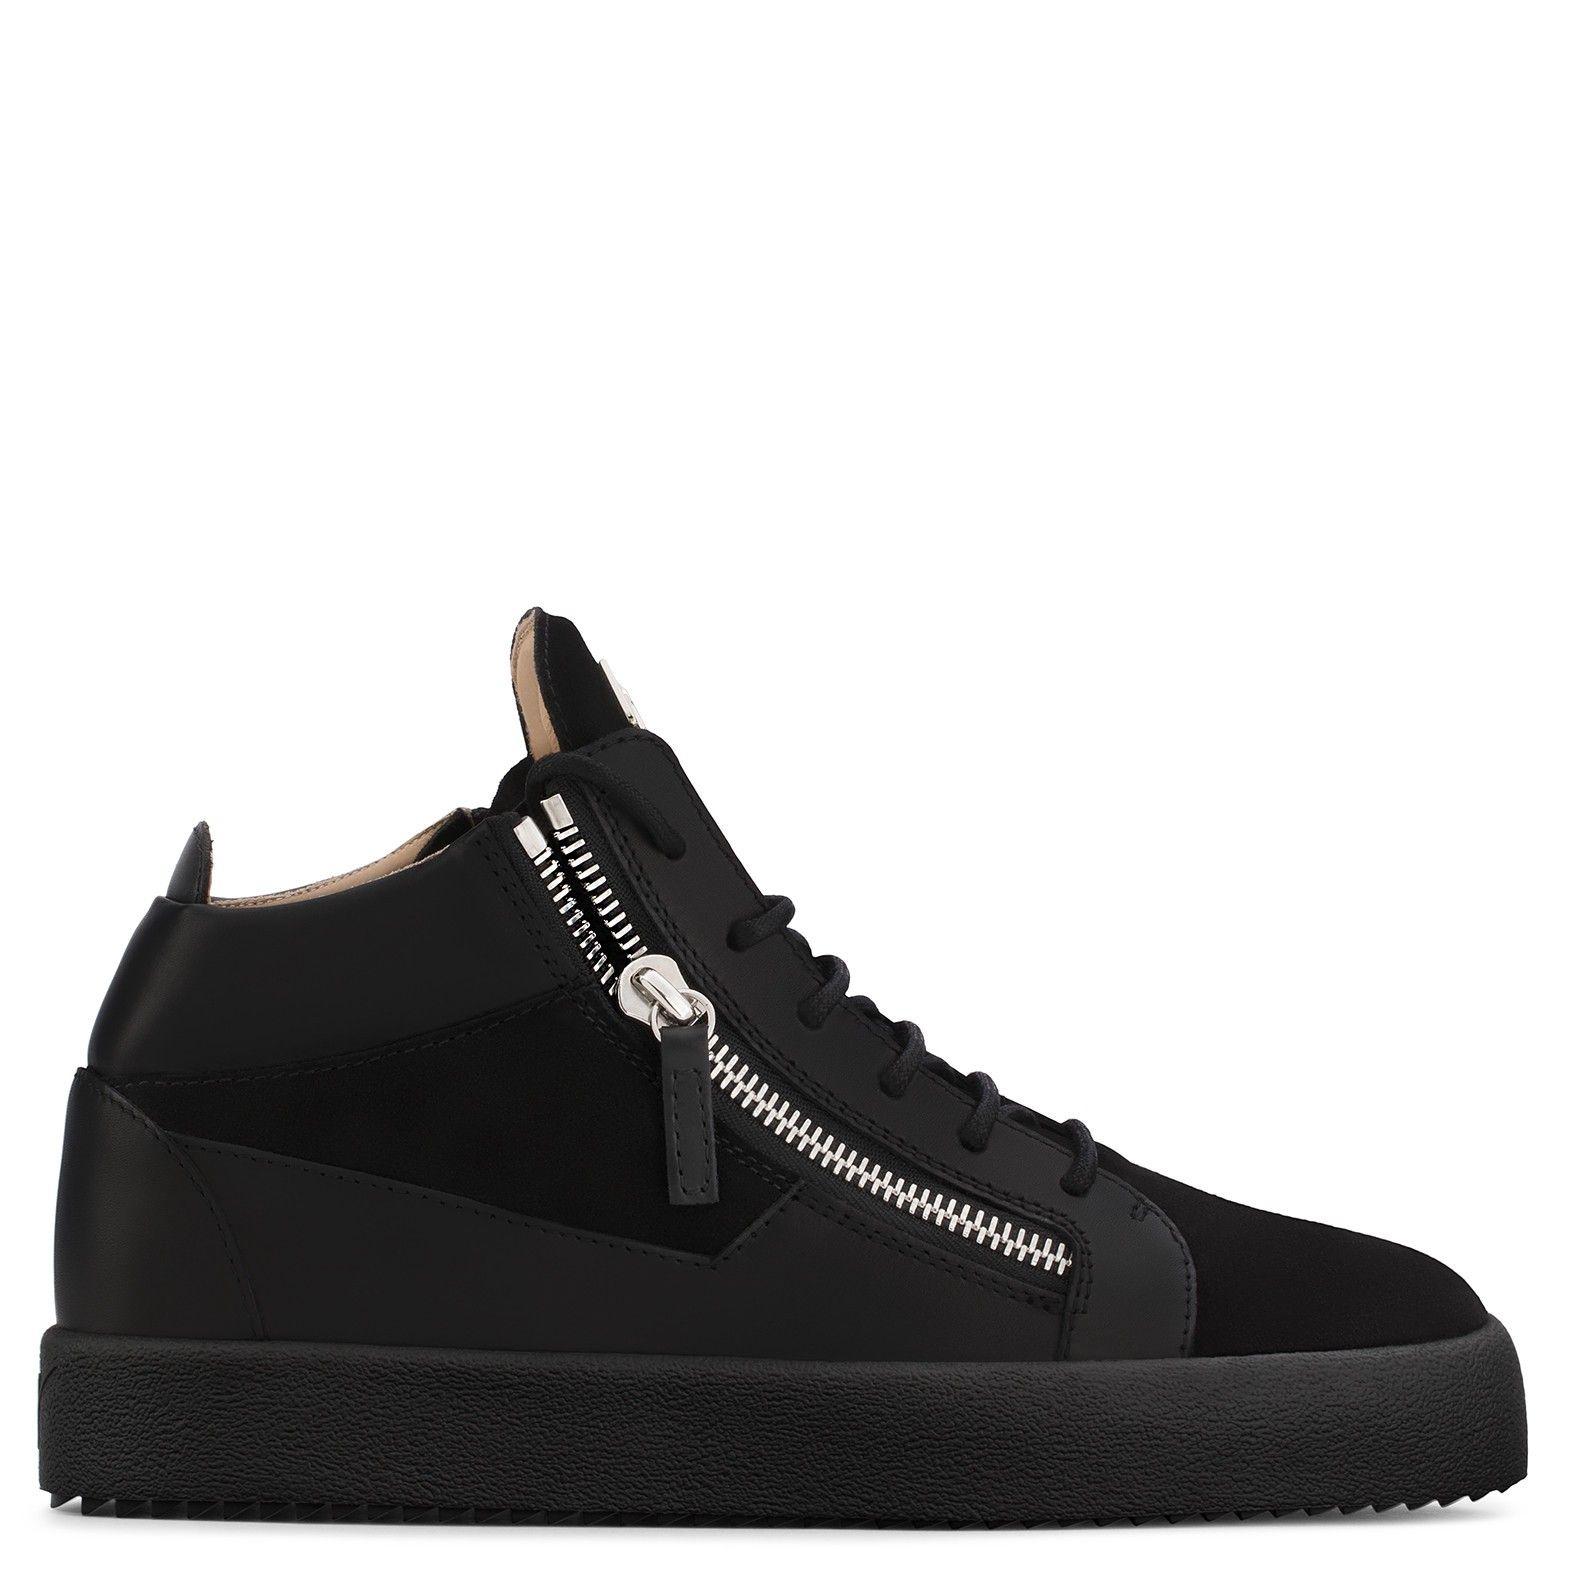 GIUSEPPE ZANOTTI KRISS - Black. #giuseppezanotti #shoes #